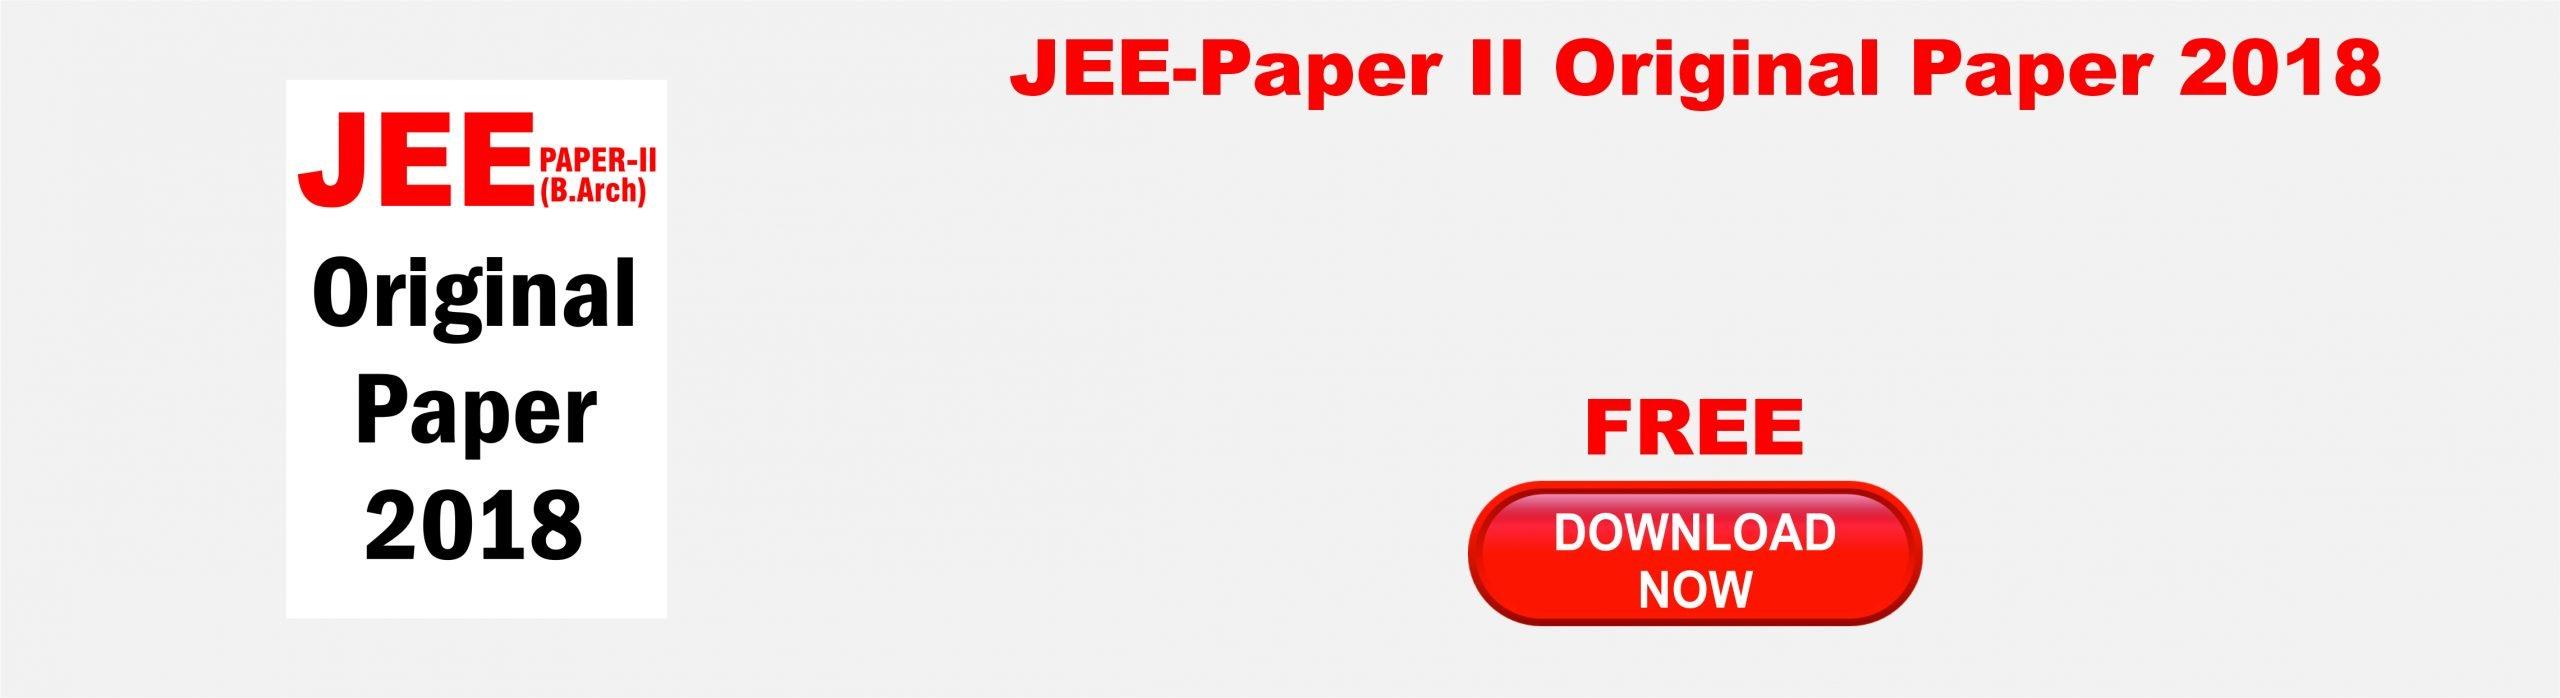 JEE Paper II Original Paper 2018